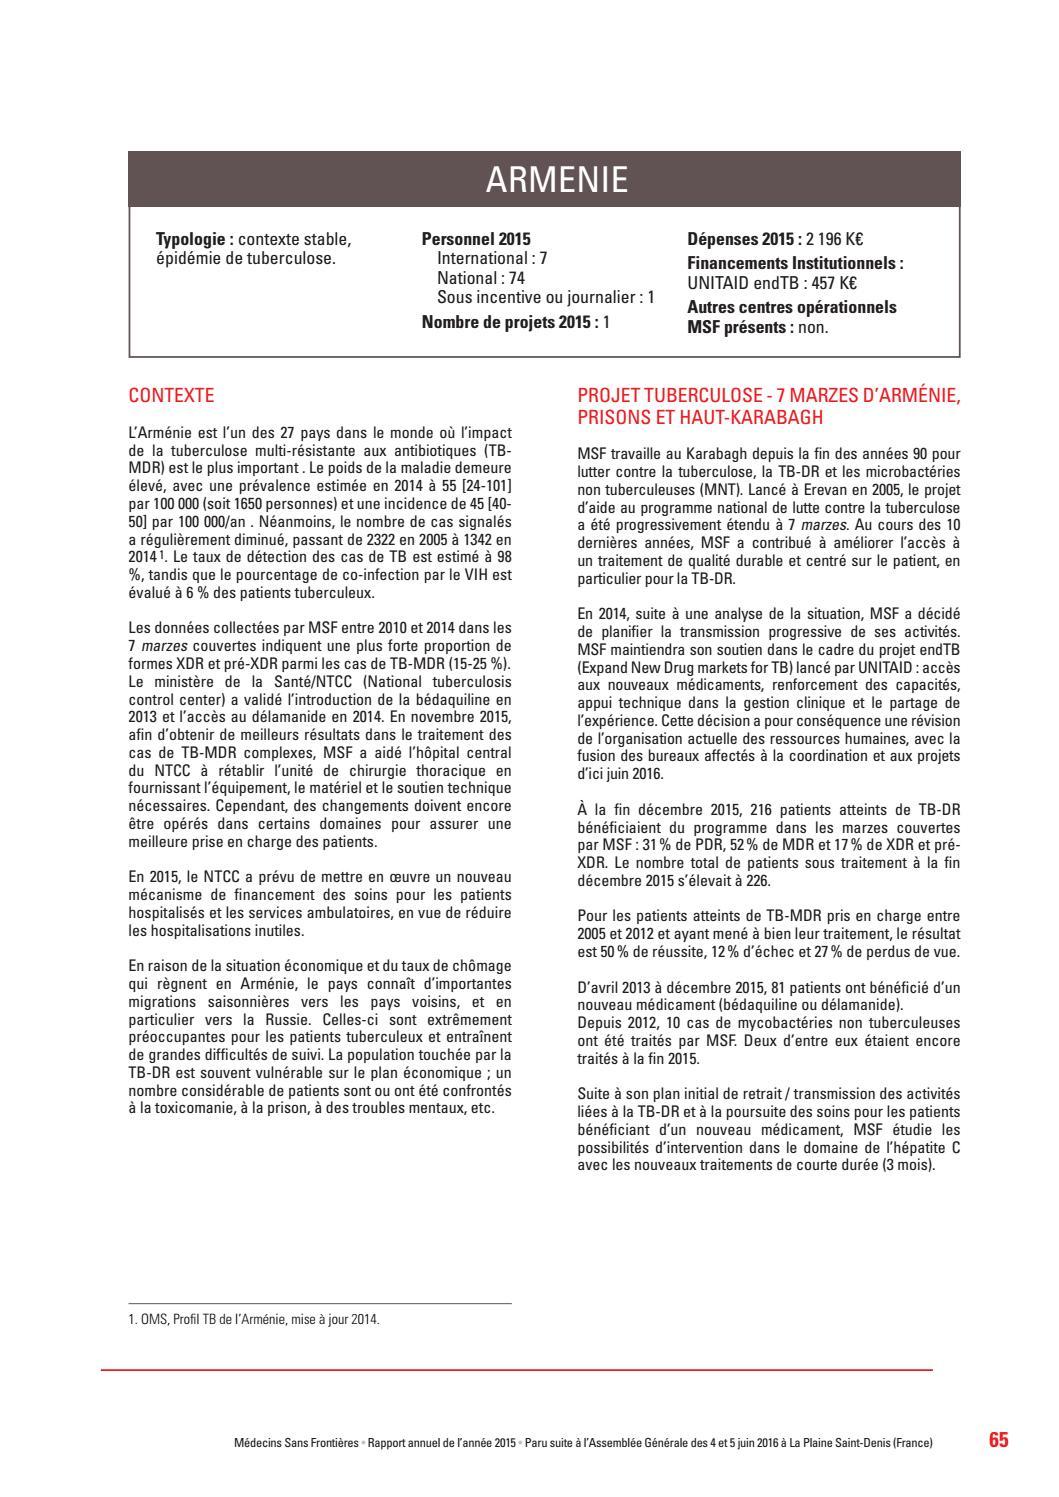 Rapport Annuel De Msf 2015 2016 By Medecins Sans Frontieres France